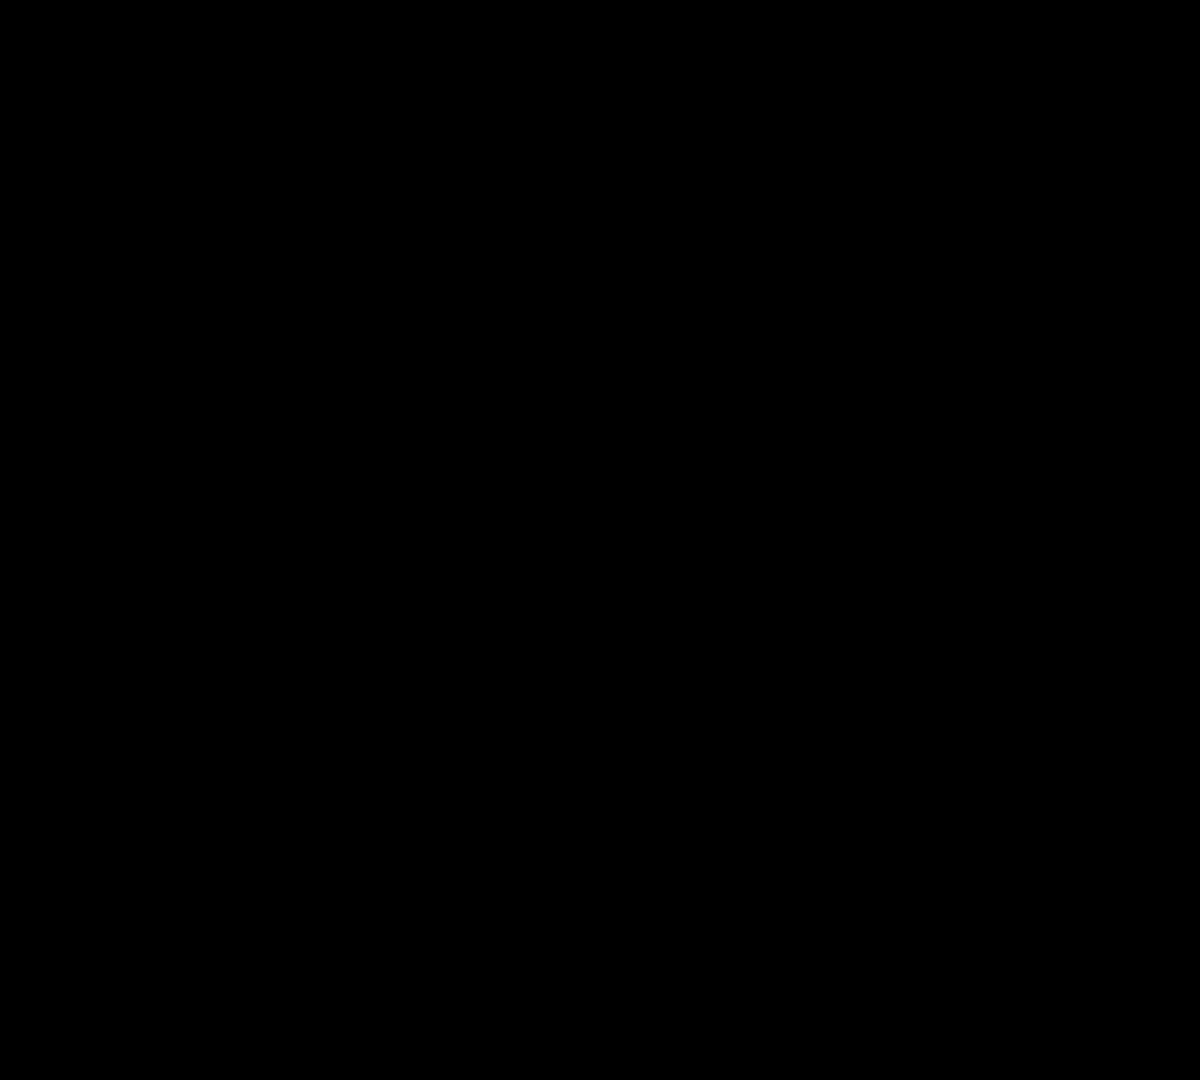 News clipart tv broadcasting. Kcpq wikipedia